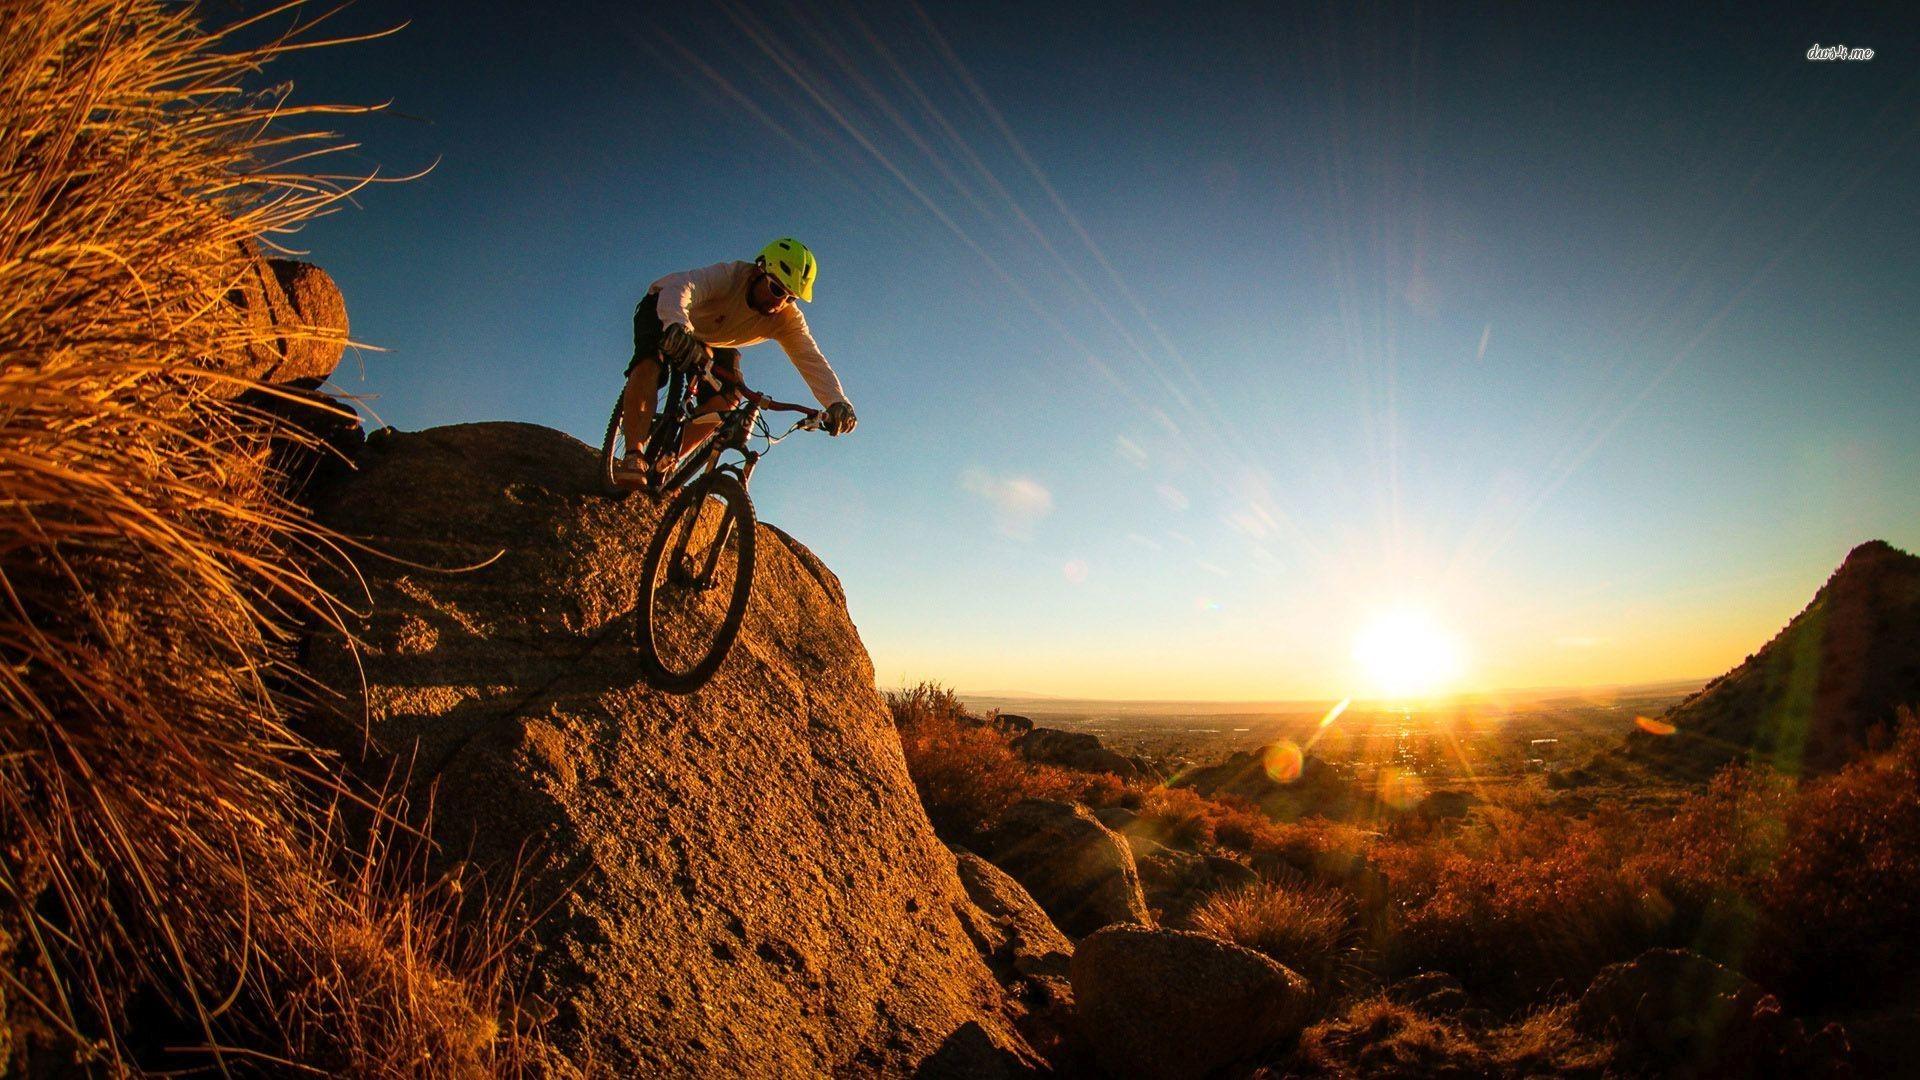 mountain-bike-racing-jump-style-wallpaper | Mountain biking | Pinterest